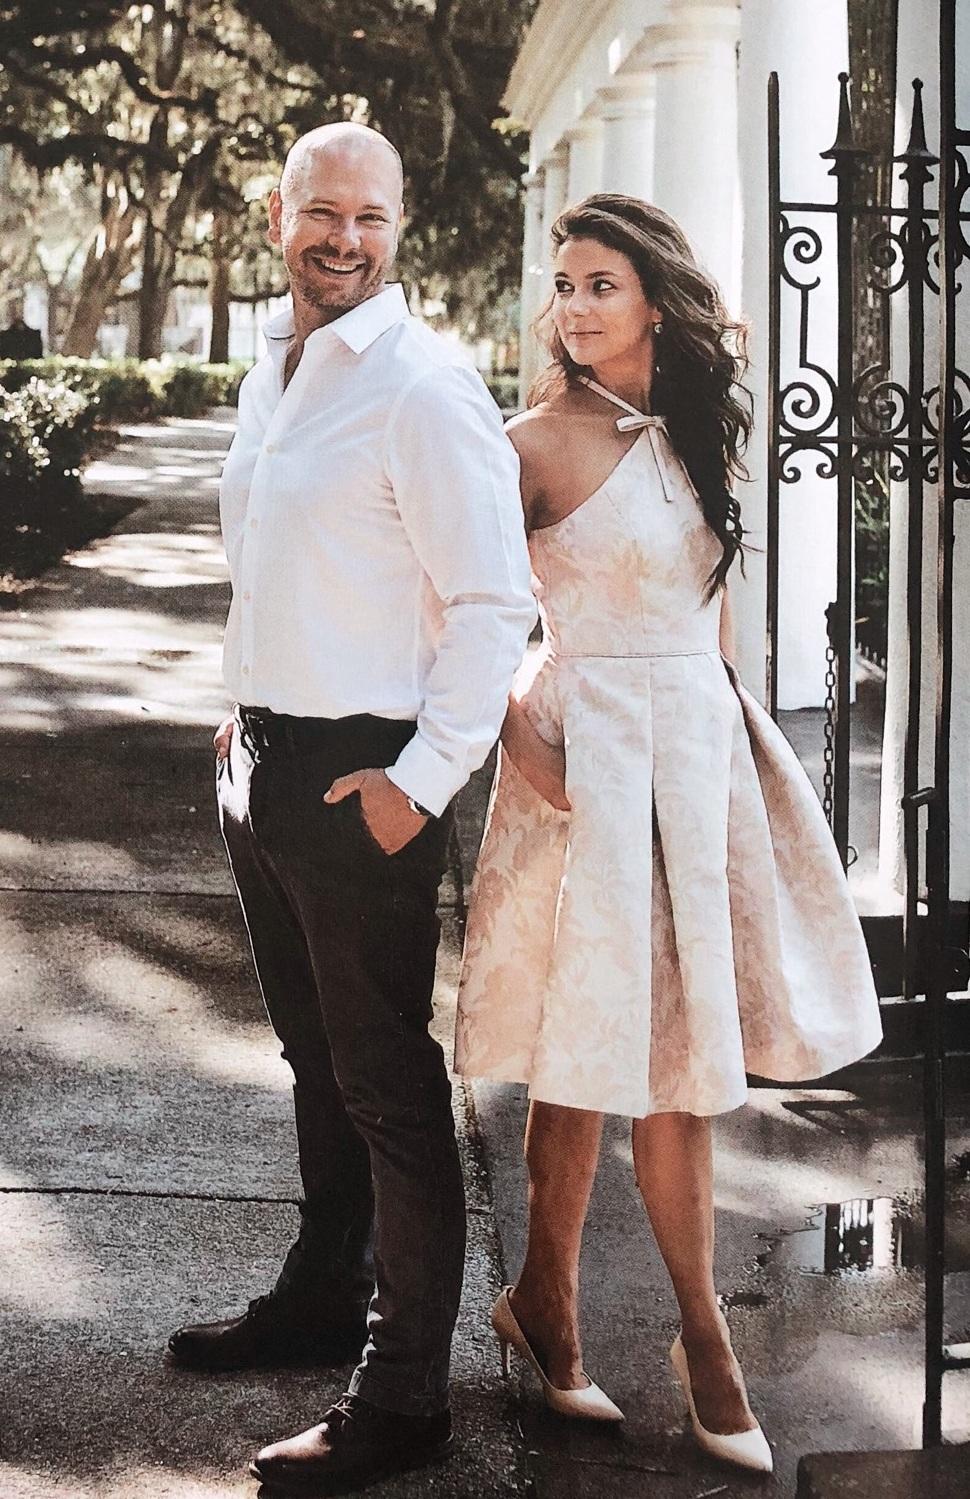 T.C. & Brenna Michaels | Owners of Genteel & Bard Fine Savannah Walking Tours